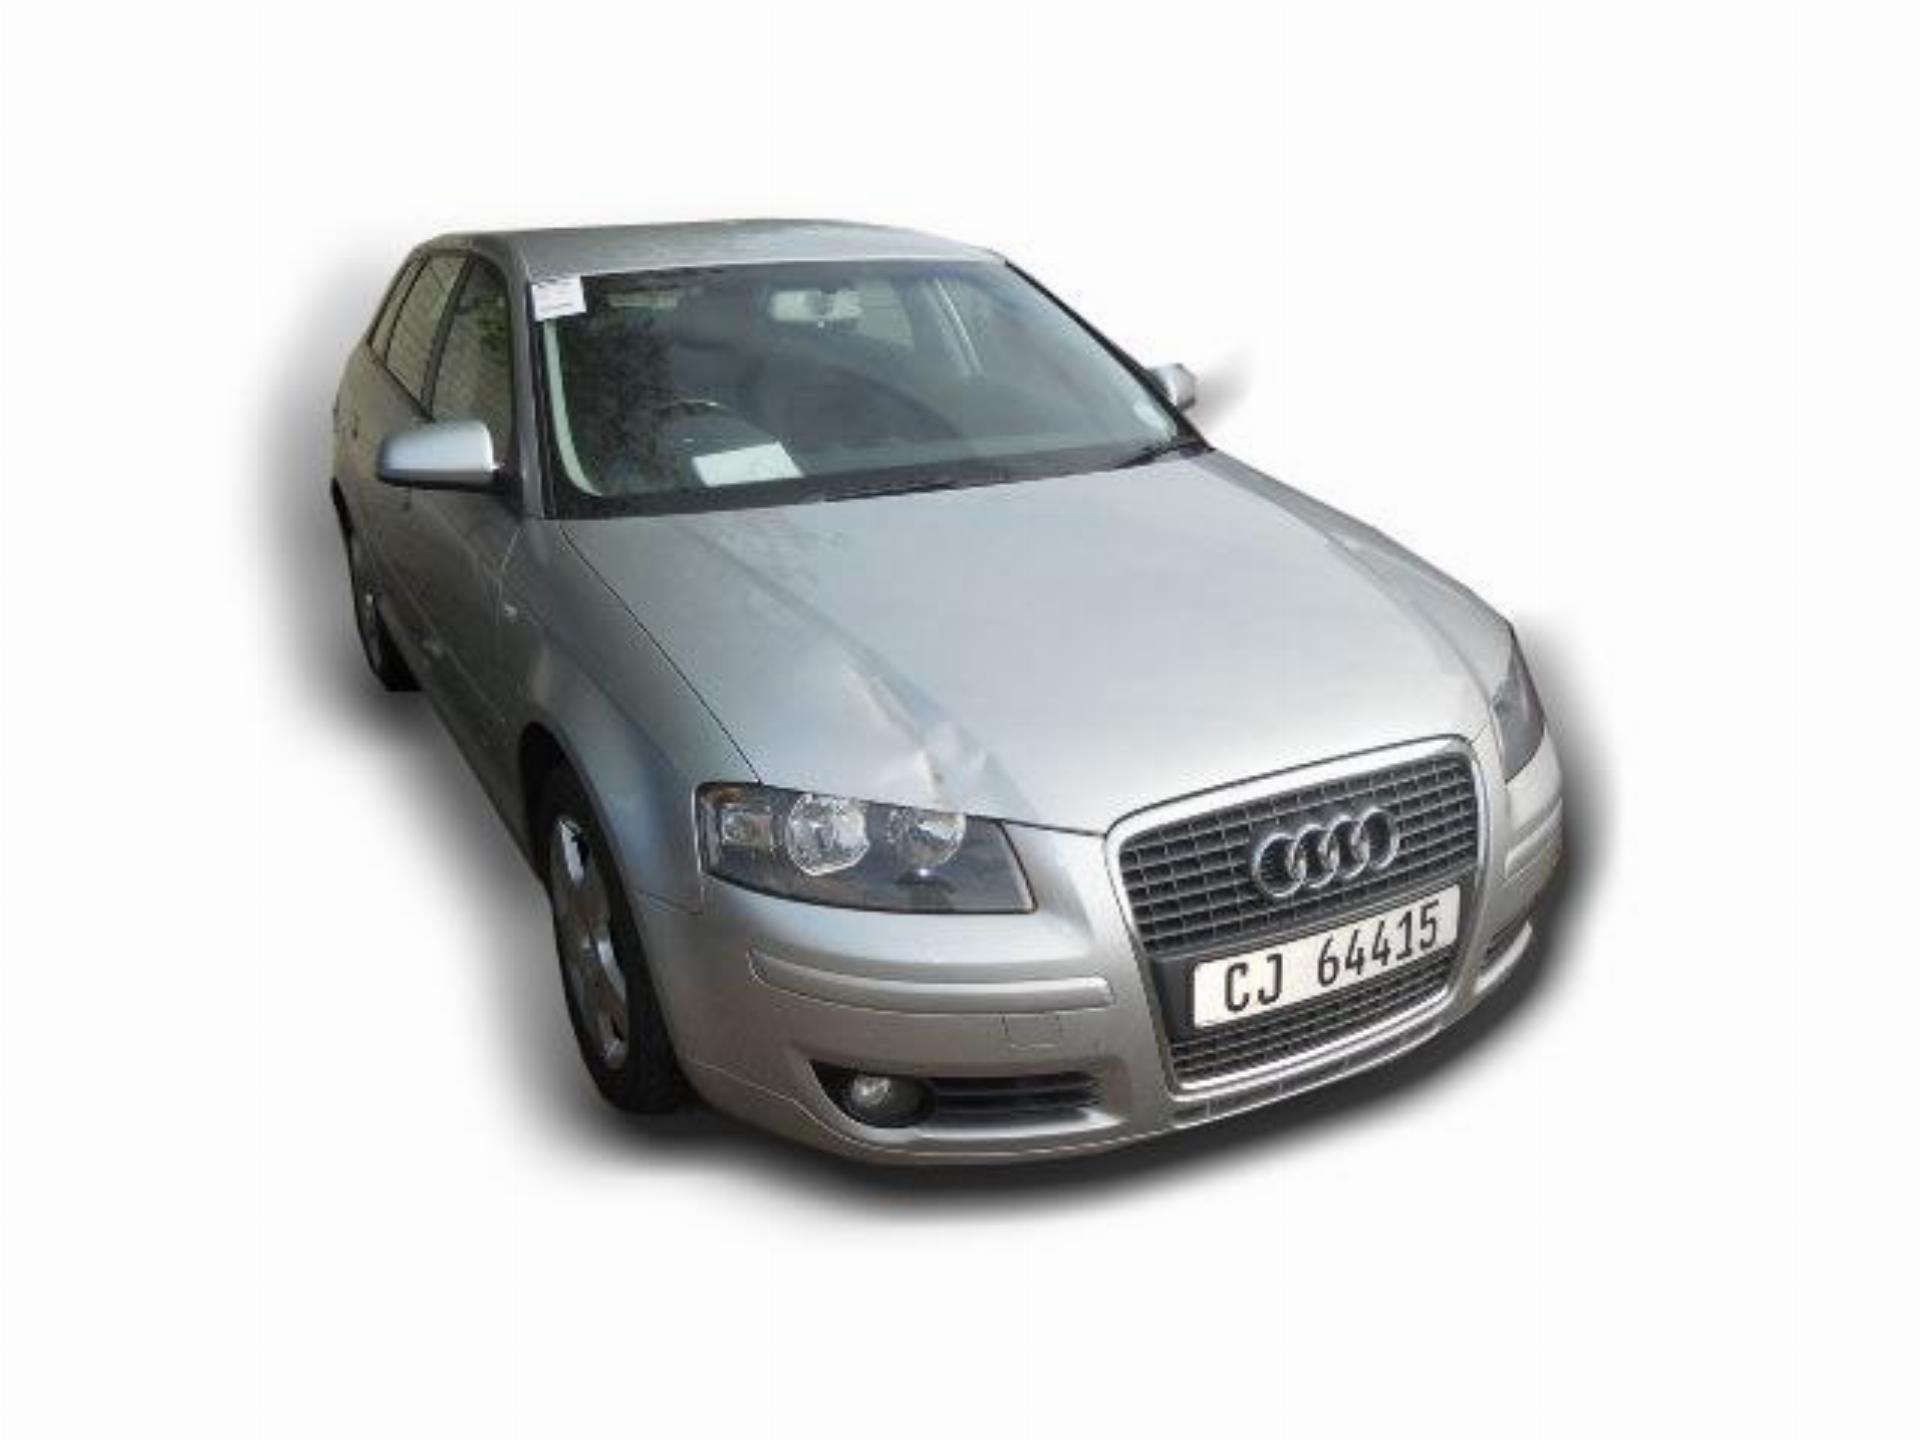 Audi A3 Sportback 2.0 Fsi Auto